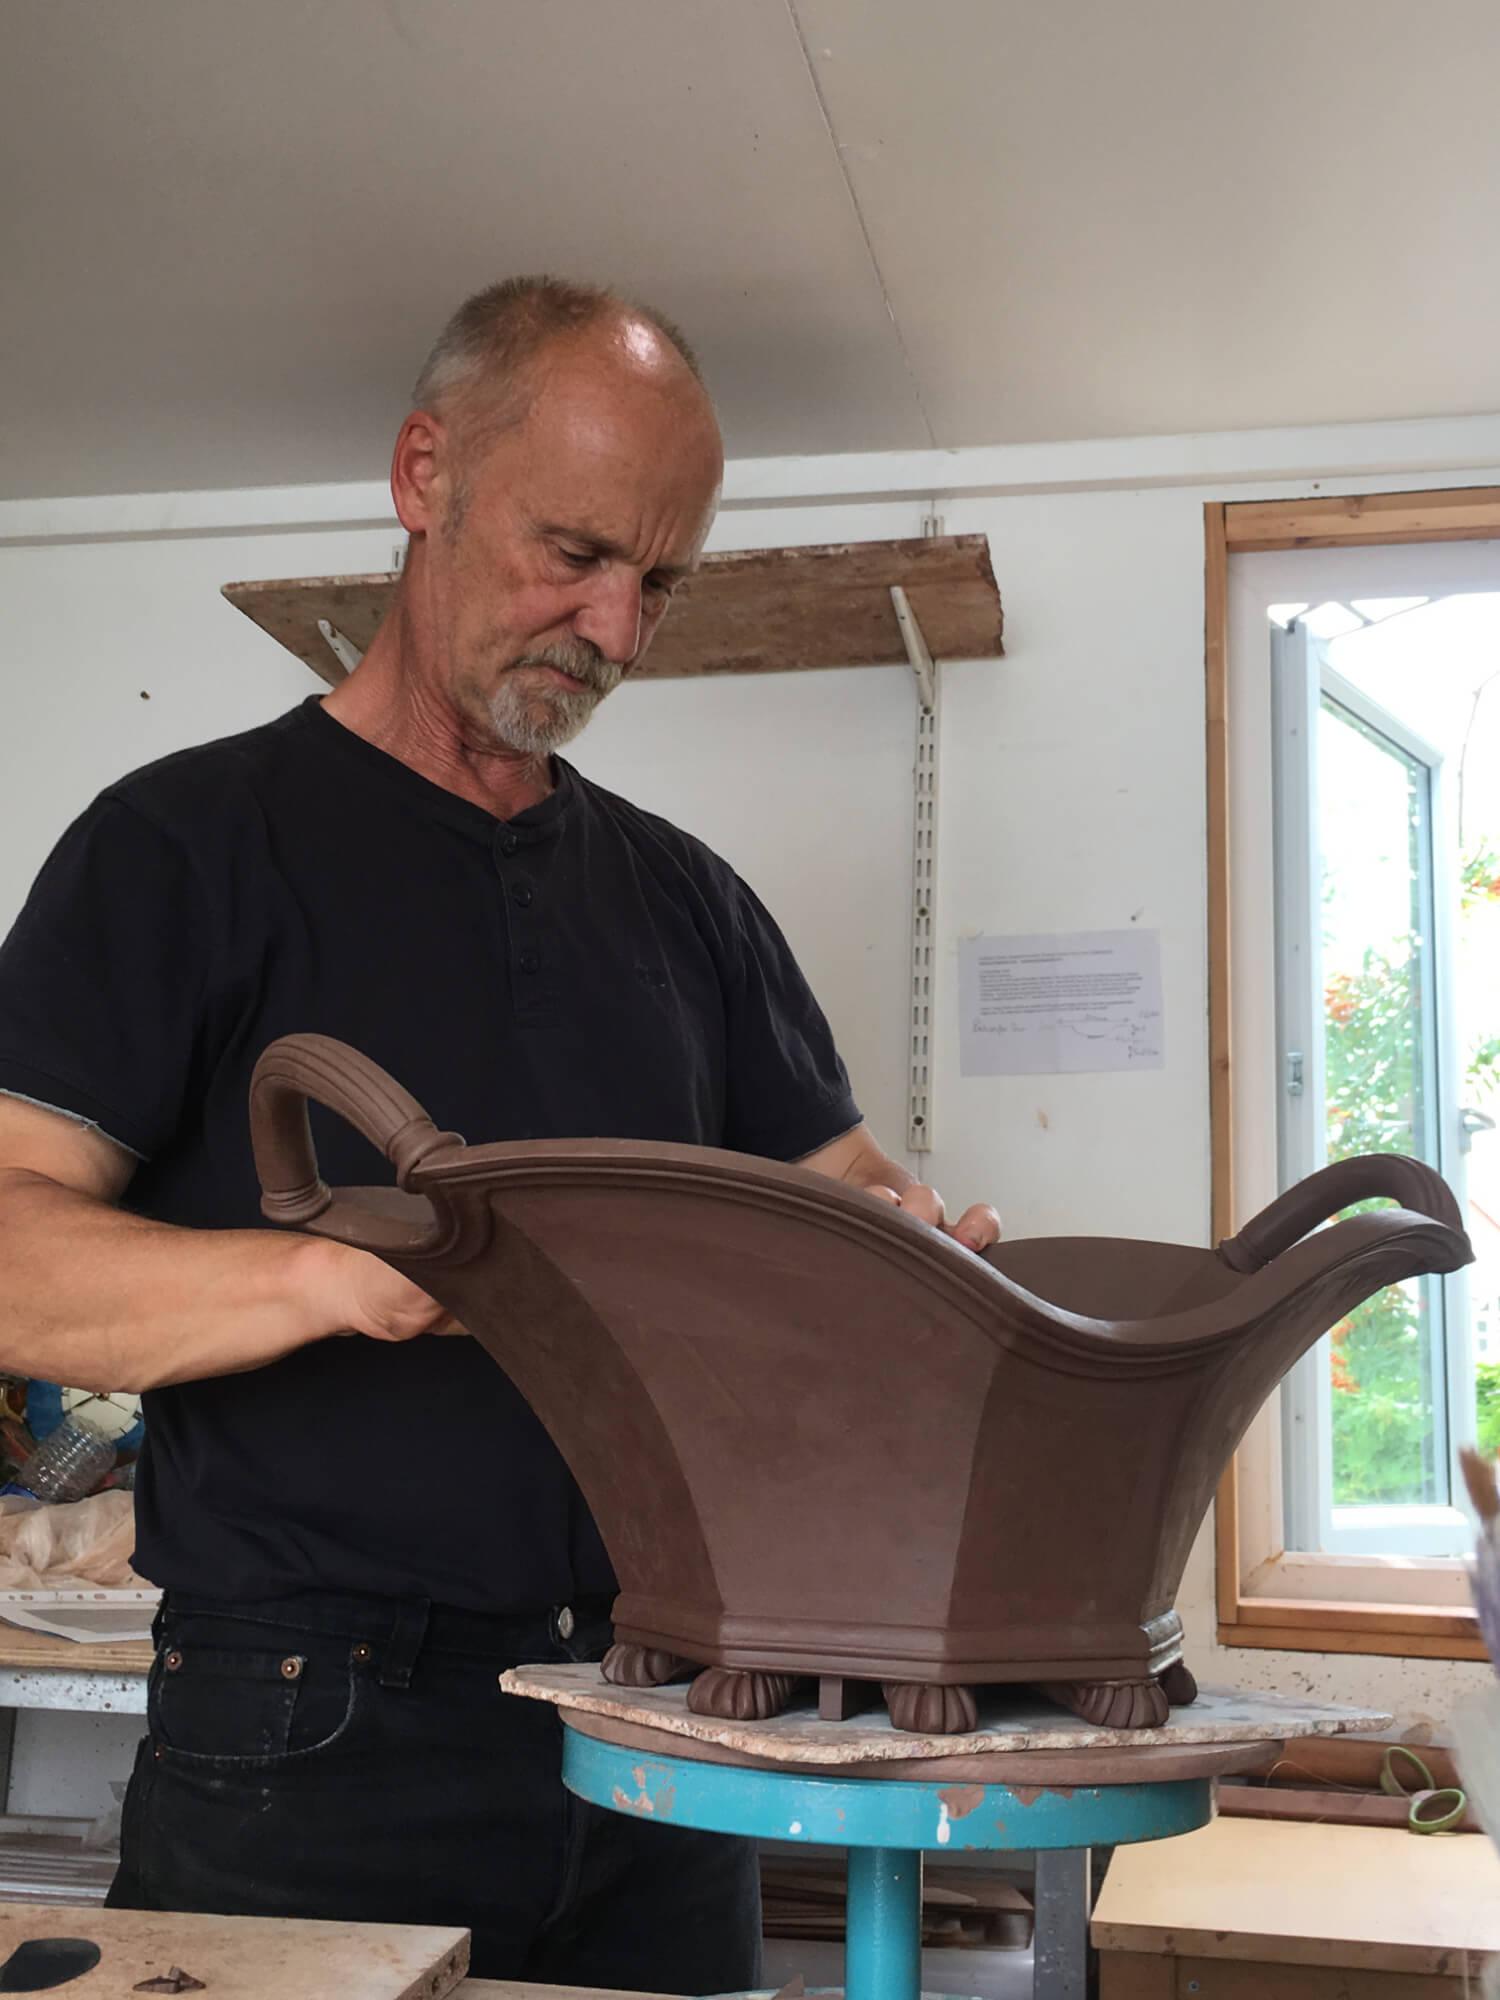 Building a 'Welk bowl'